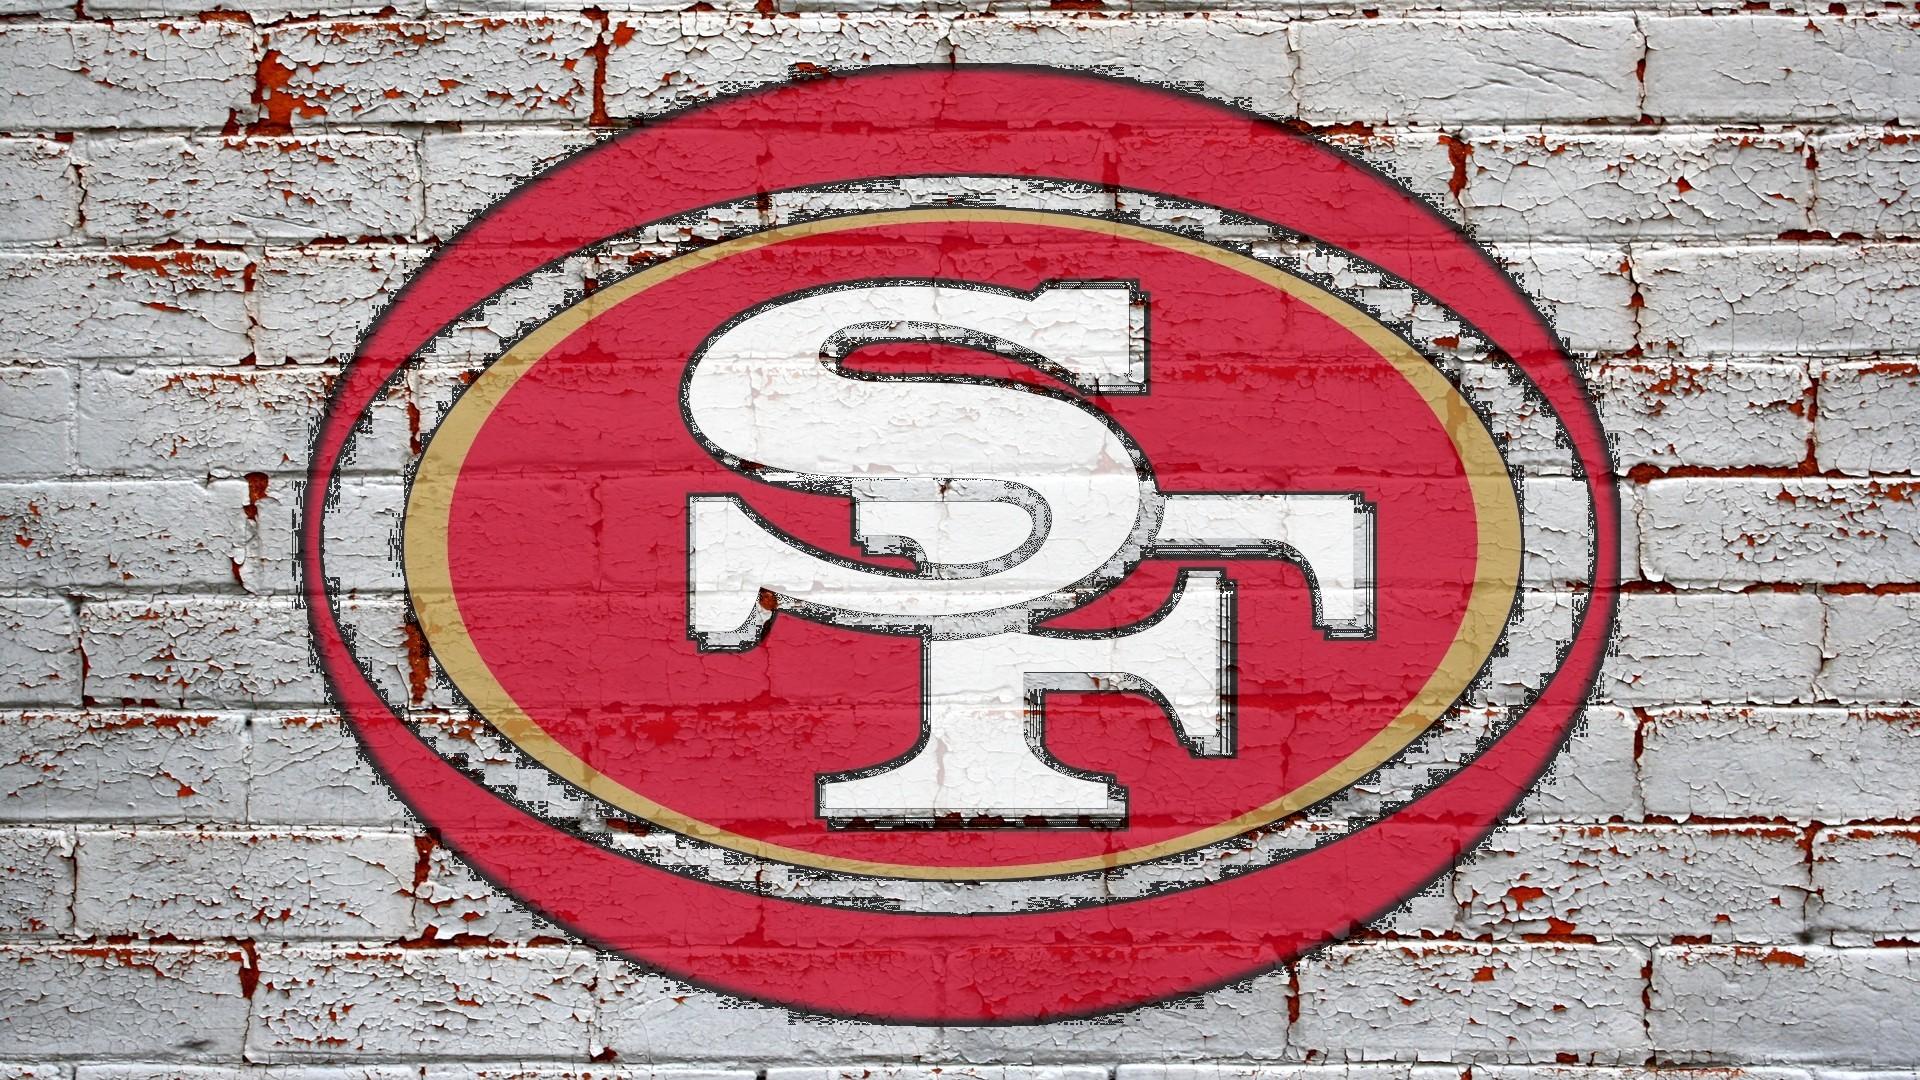 San Francisco 49ers Nfl 1920x1080 Hd Images 1920x1080